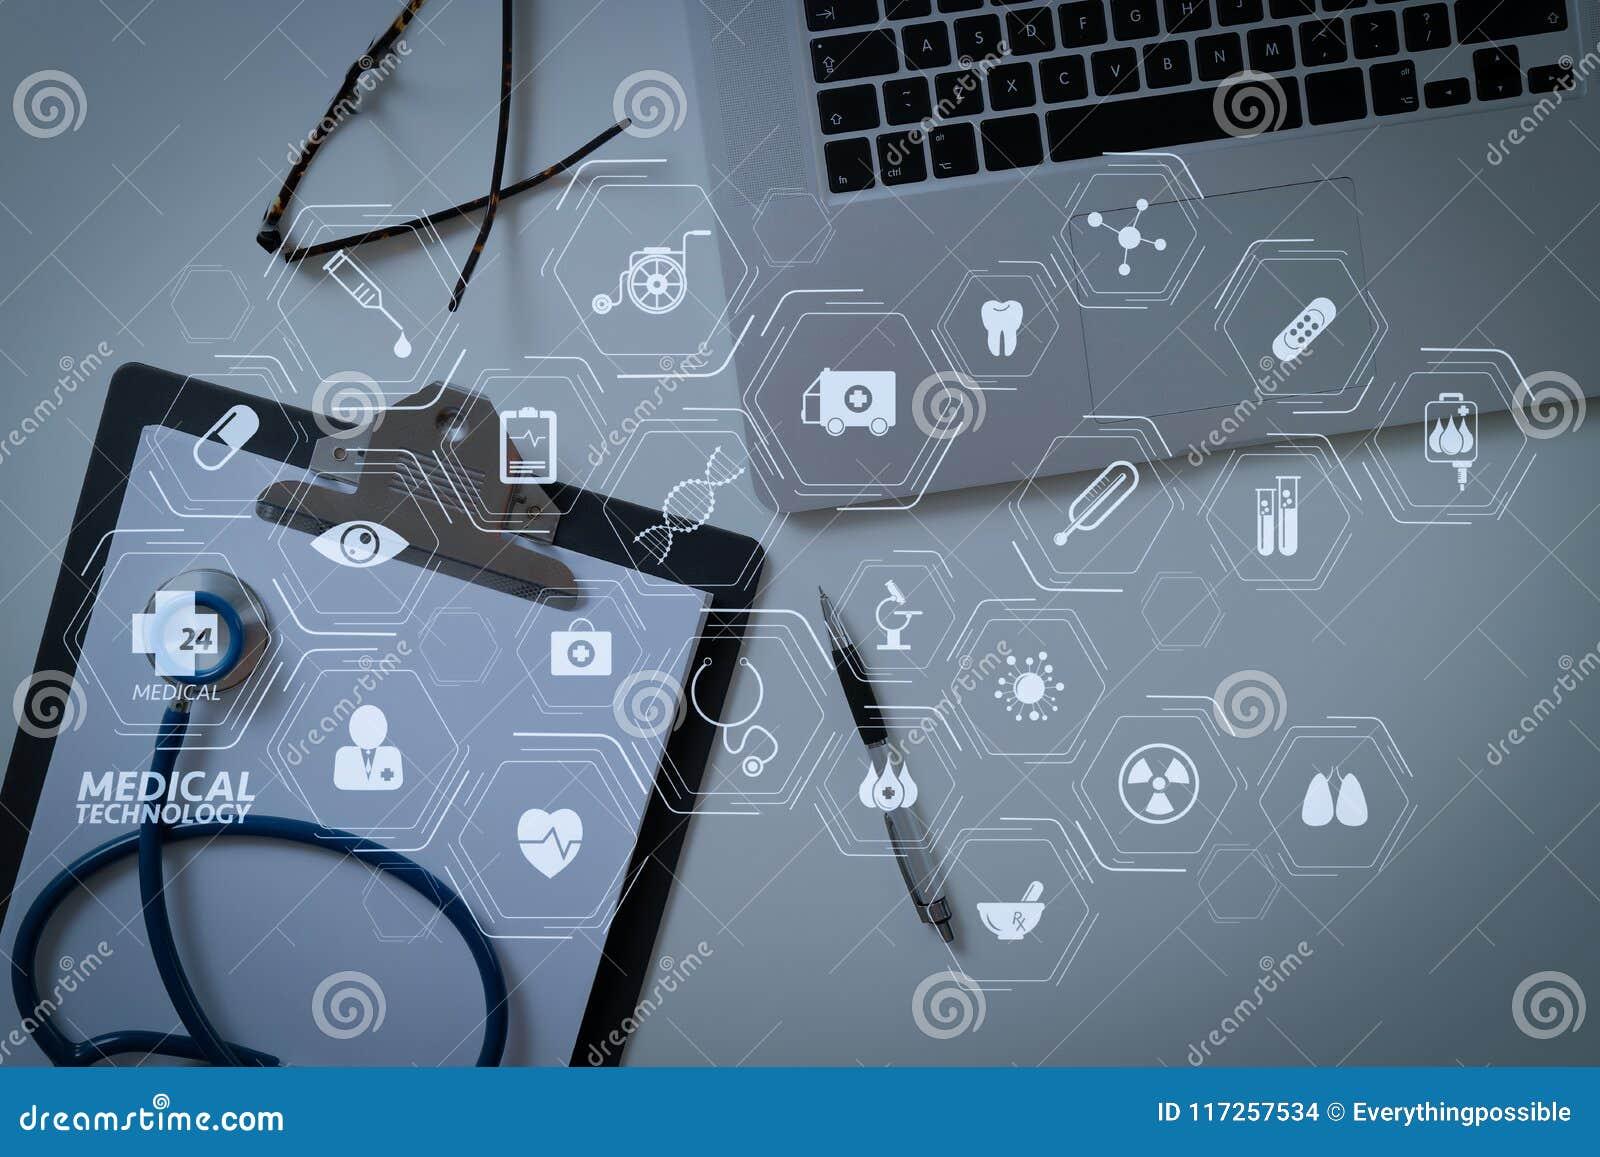 modern vr medical technology diagram concept blank stethoscope gray clipboard eyeglasses laptop computer white 117257534 blank stethoscope and gray clipboard and eyeglasses and laptop c